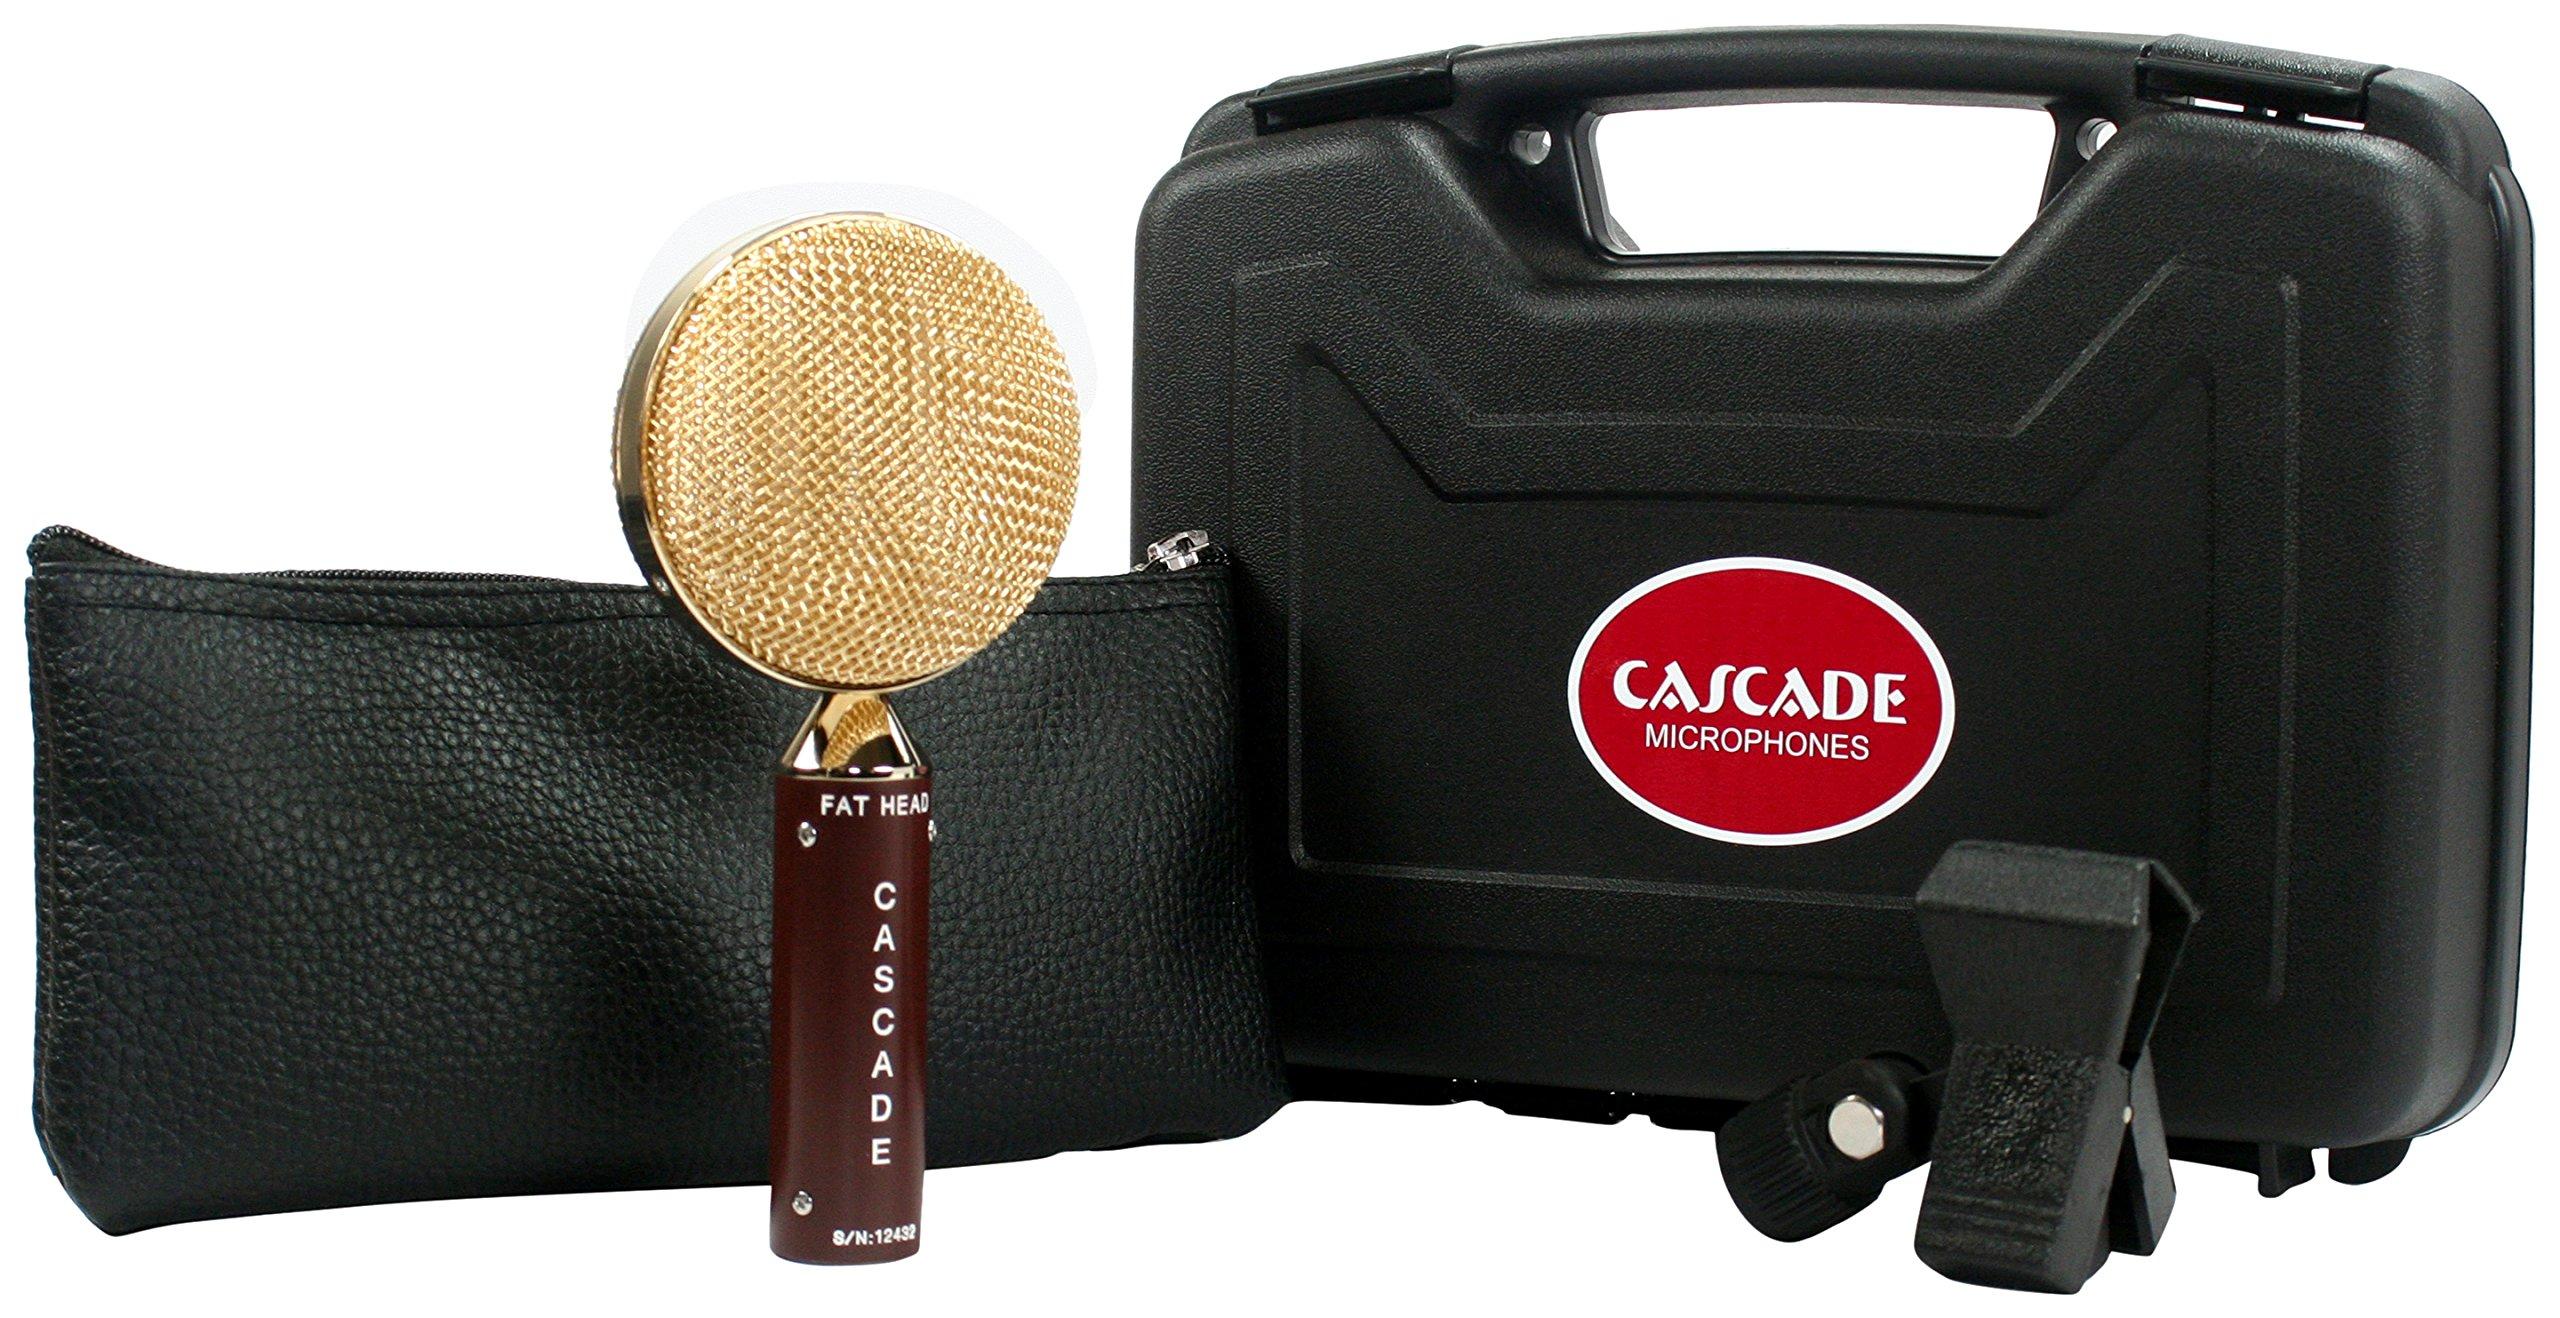 Cascade Microphones 98-G-A FAT HEAD Ribbon Microphone, Brown Body/Gold Grill by Cascade Microphones (Image #1)